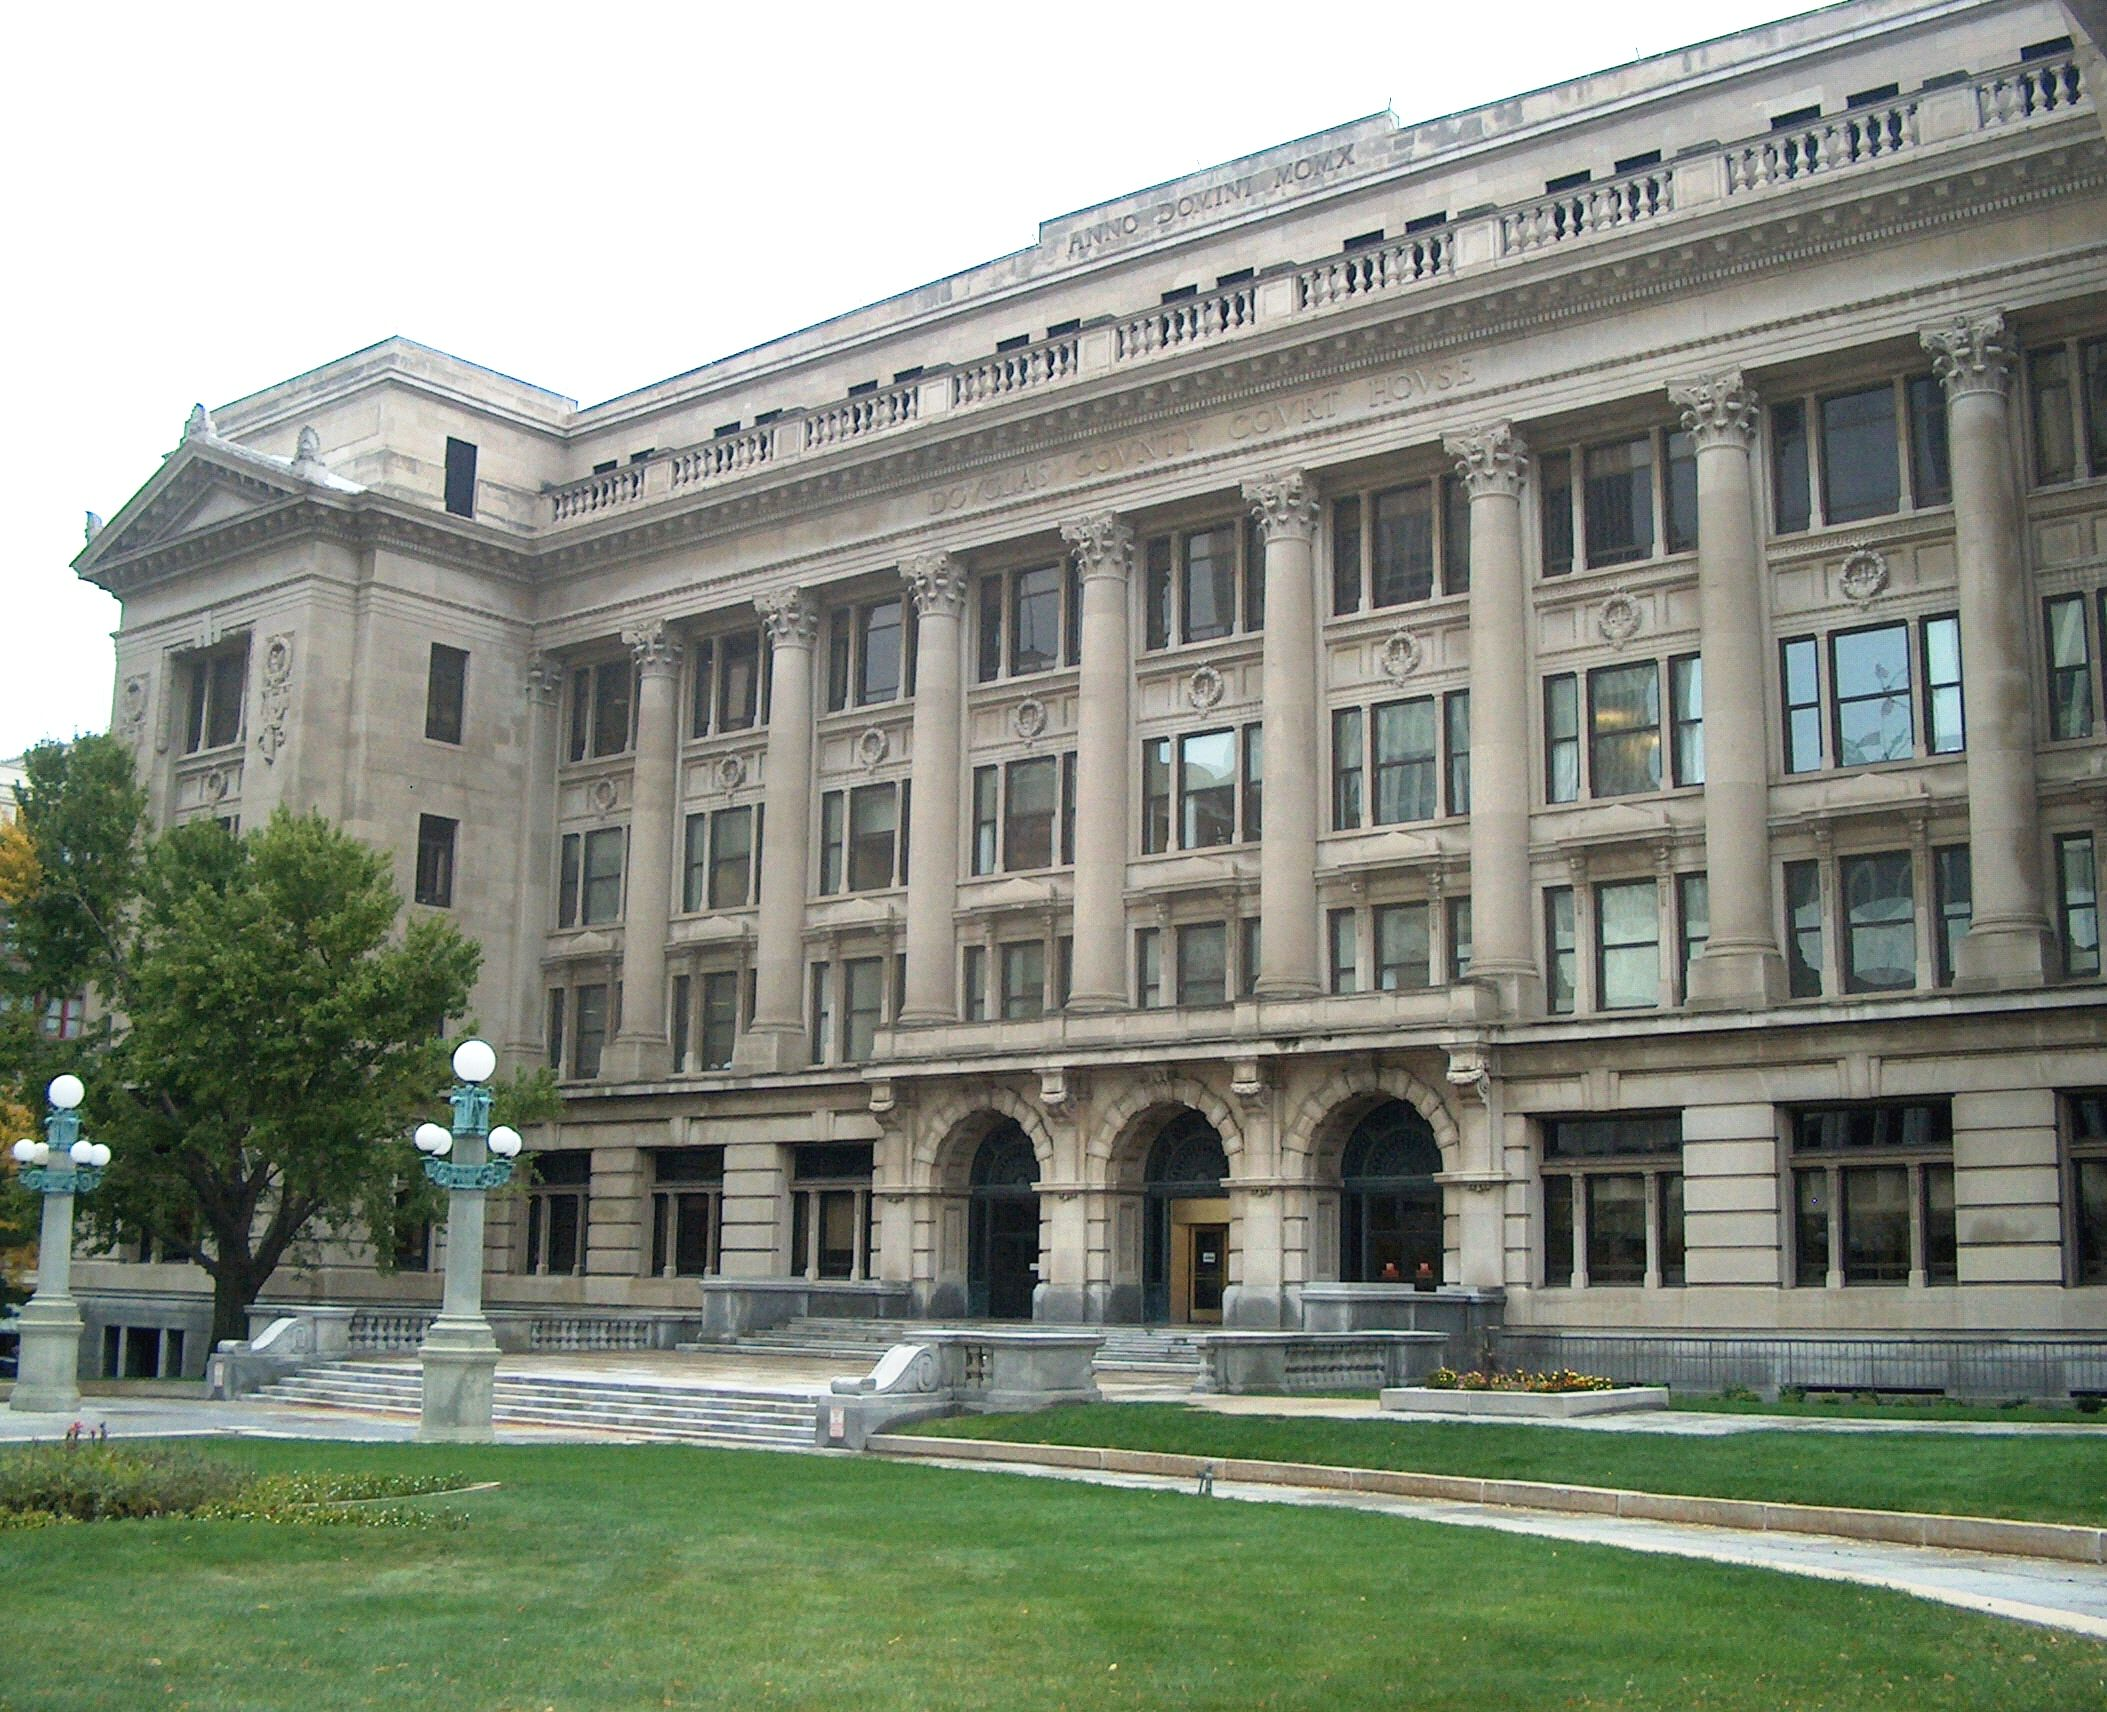 Douglas County Courthouse Omaha Nebraska Omaha Nebraska Nebraska Missouri River